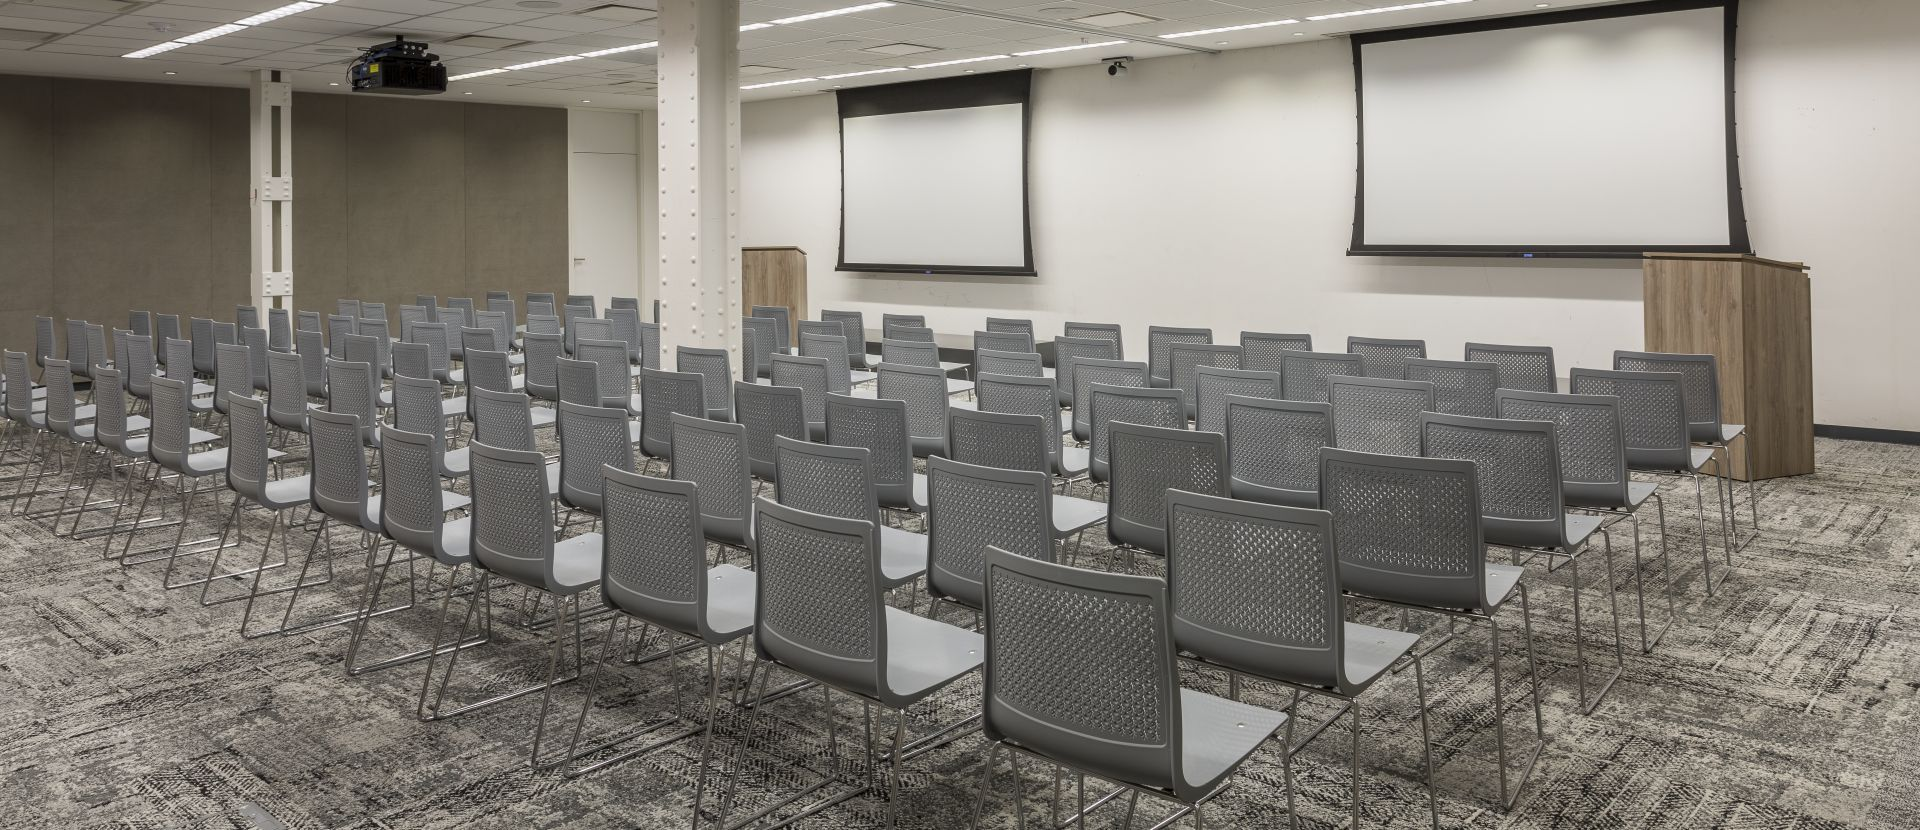 auditorio corporativo